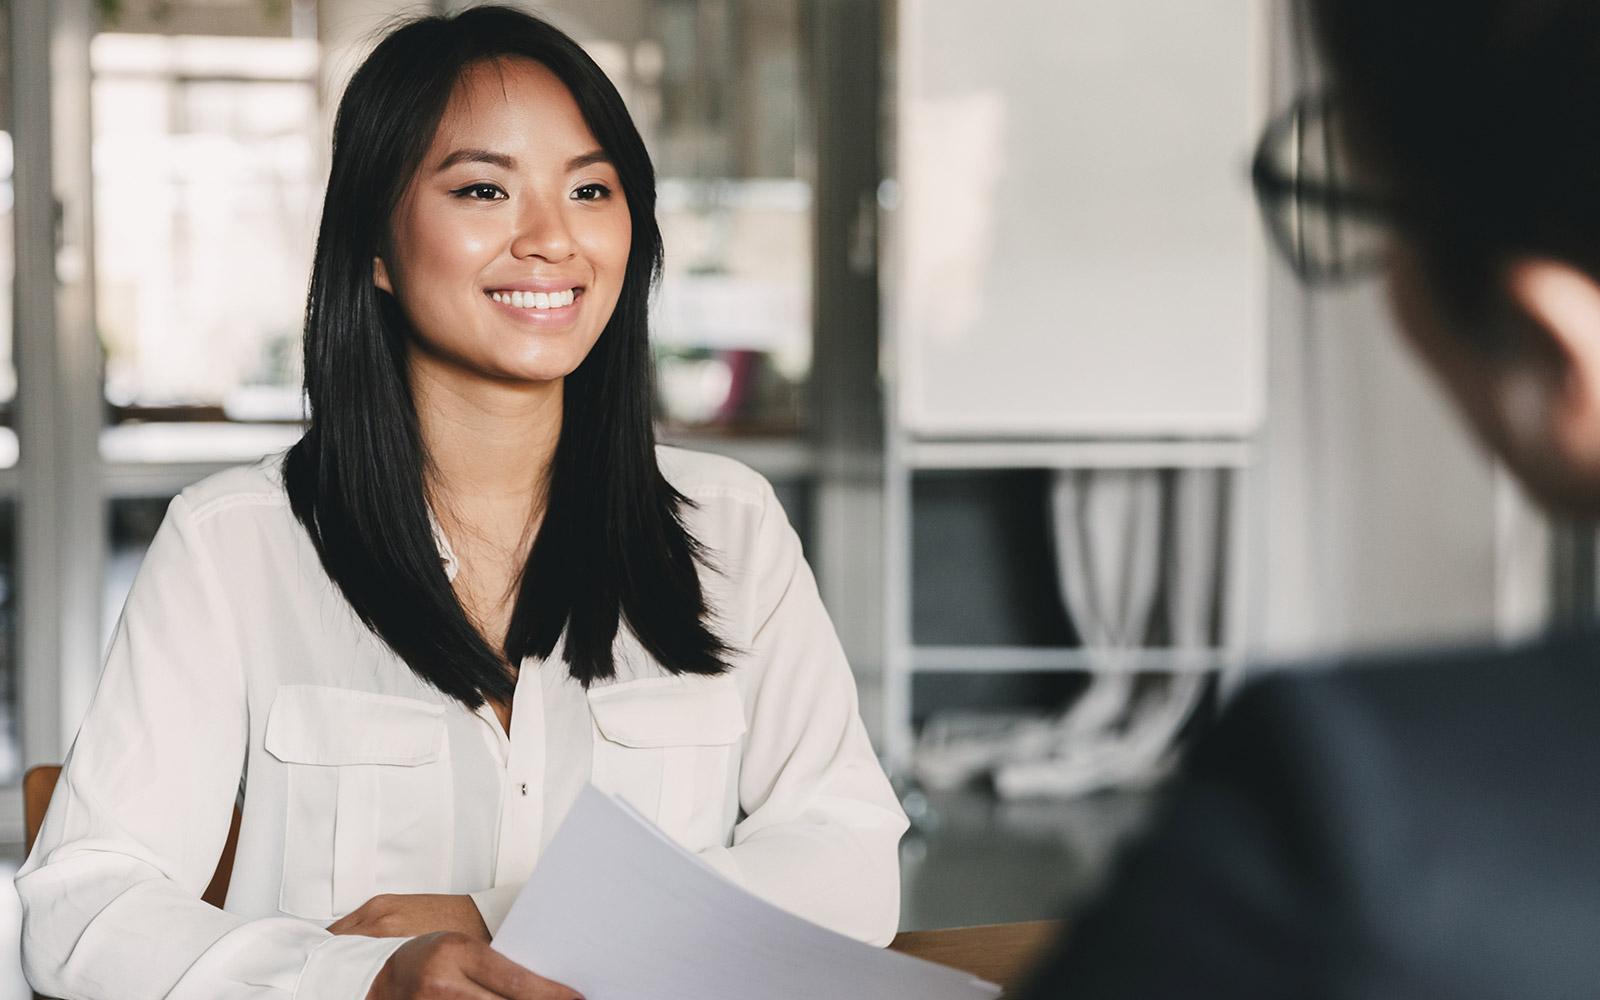 International business woman